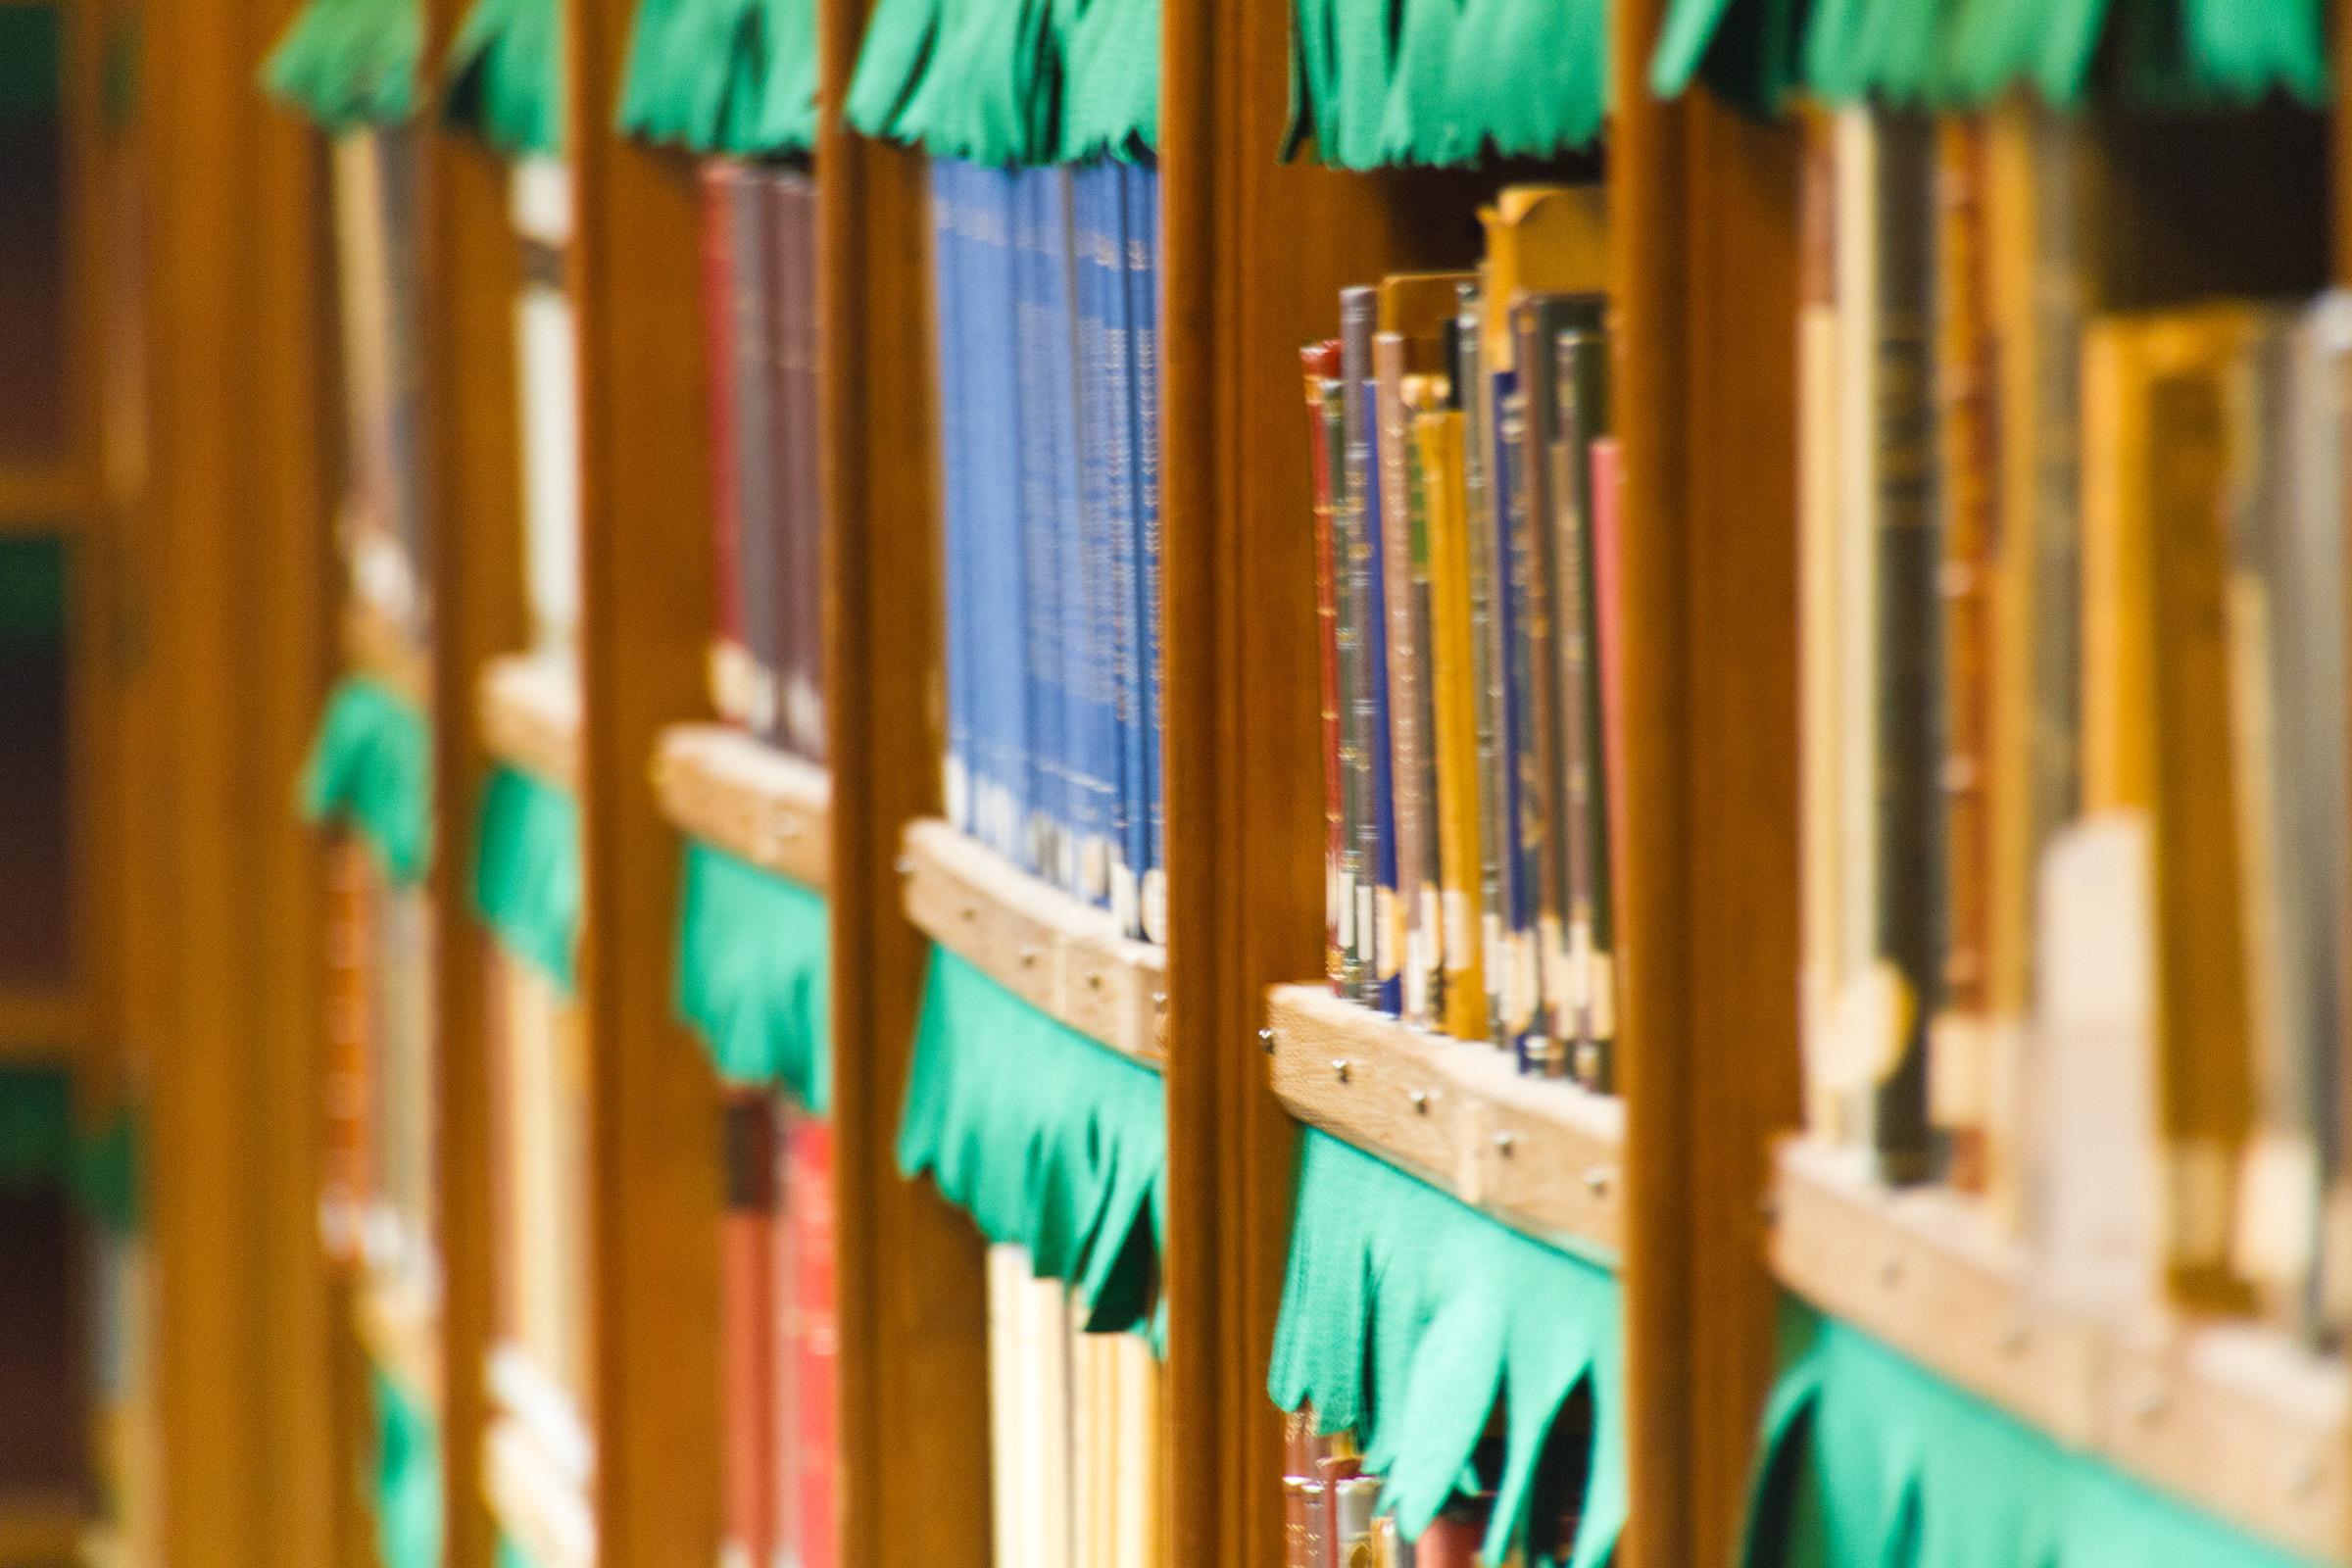 Books, Art, Rack, Multi, New, HQ Photo